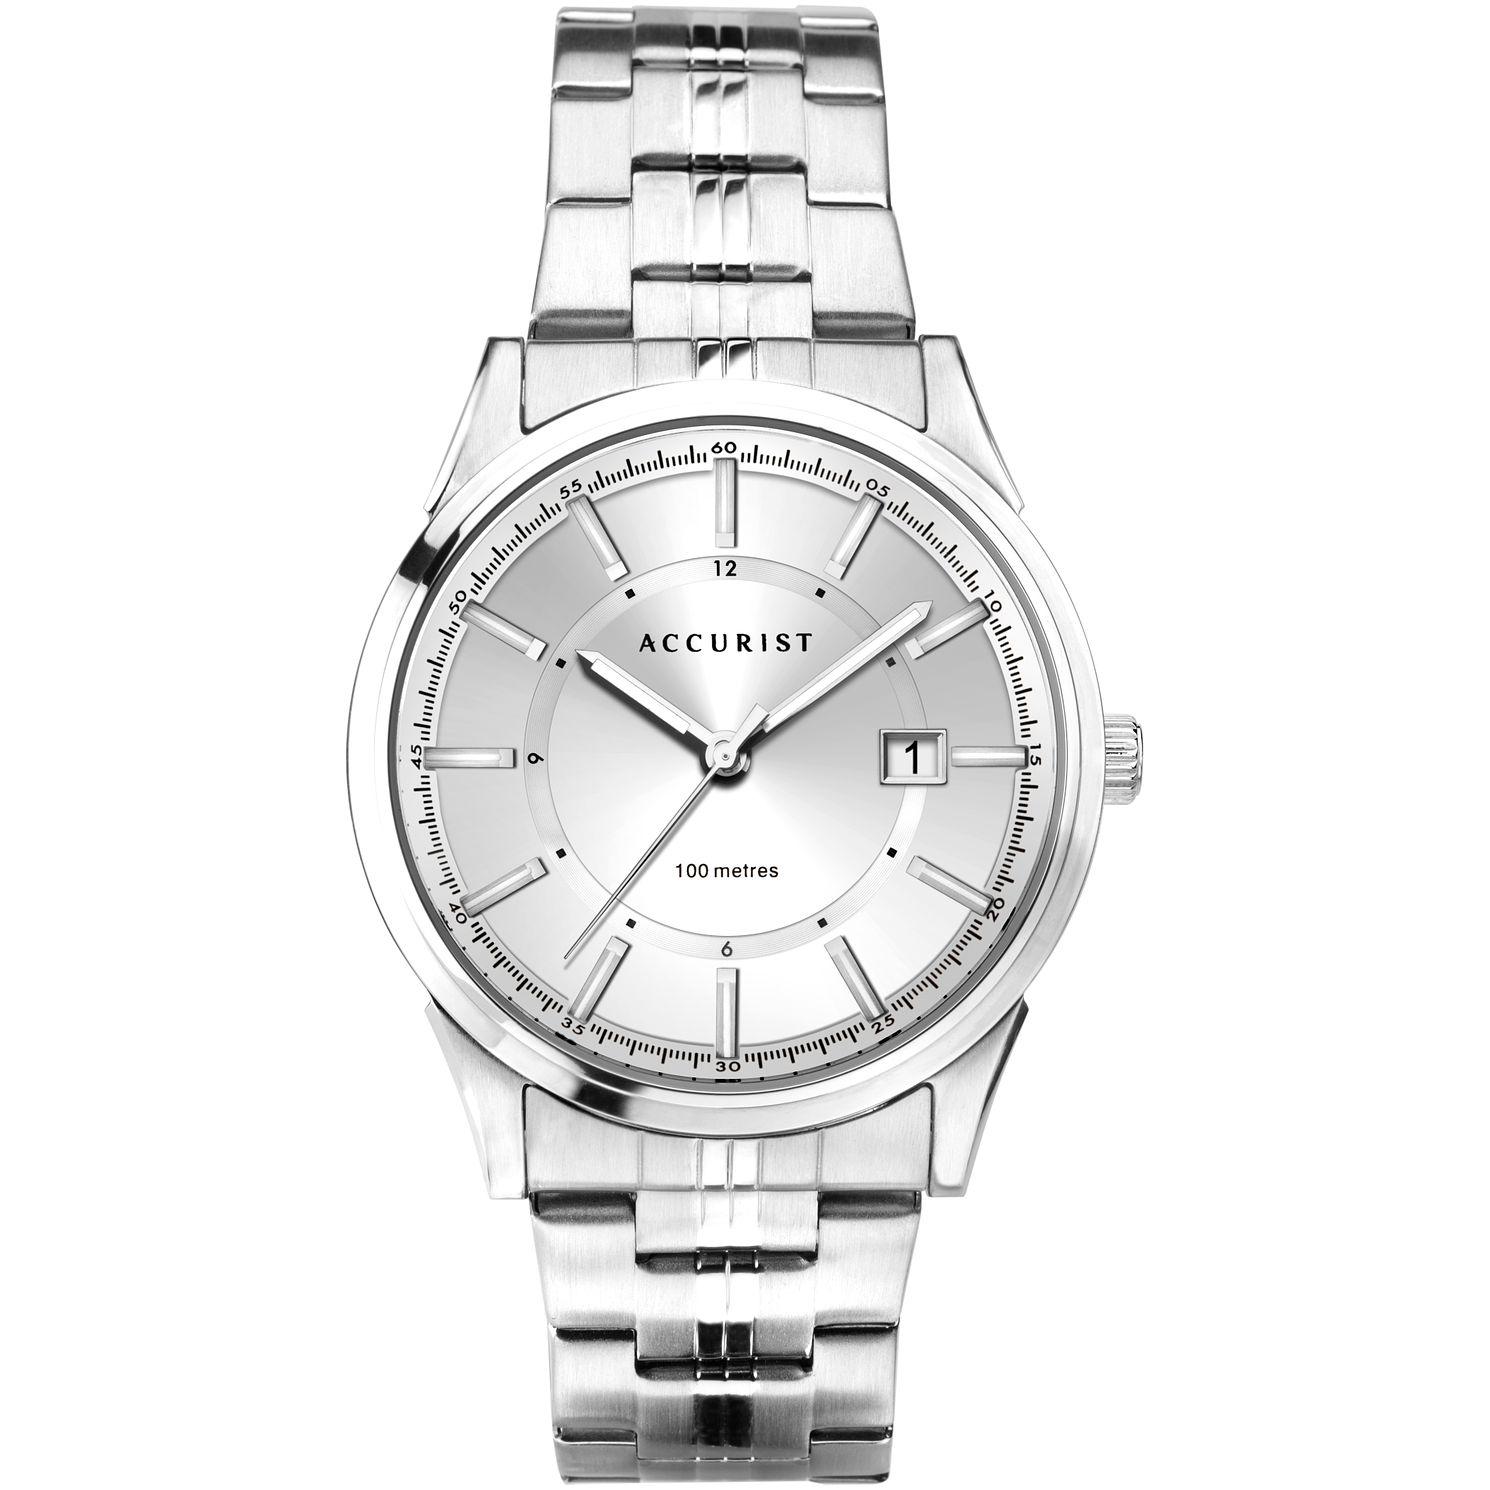 Accurist Date Men's Stainless Steel Bracelet Watch £34.98 delivered @ H Samuel